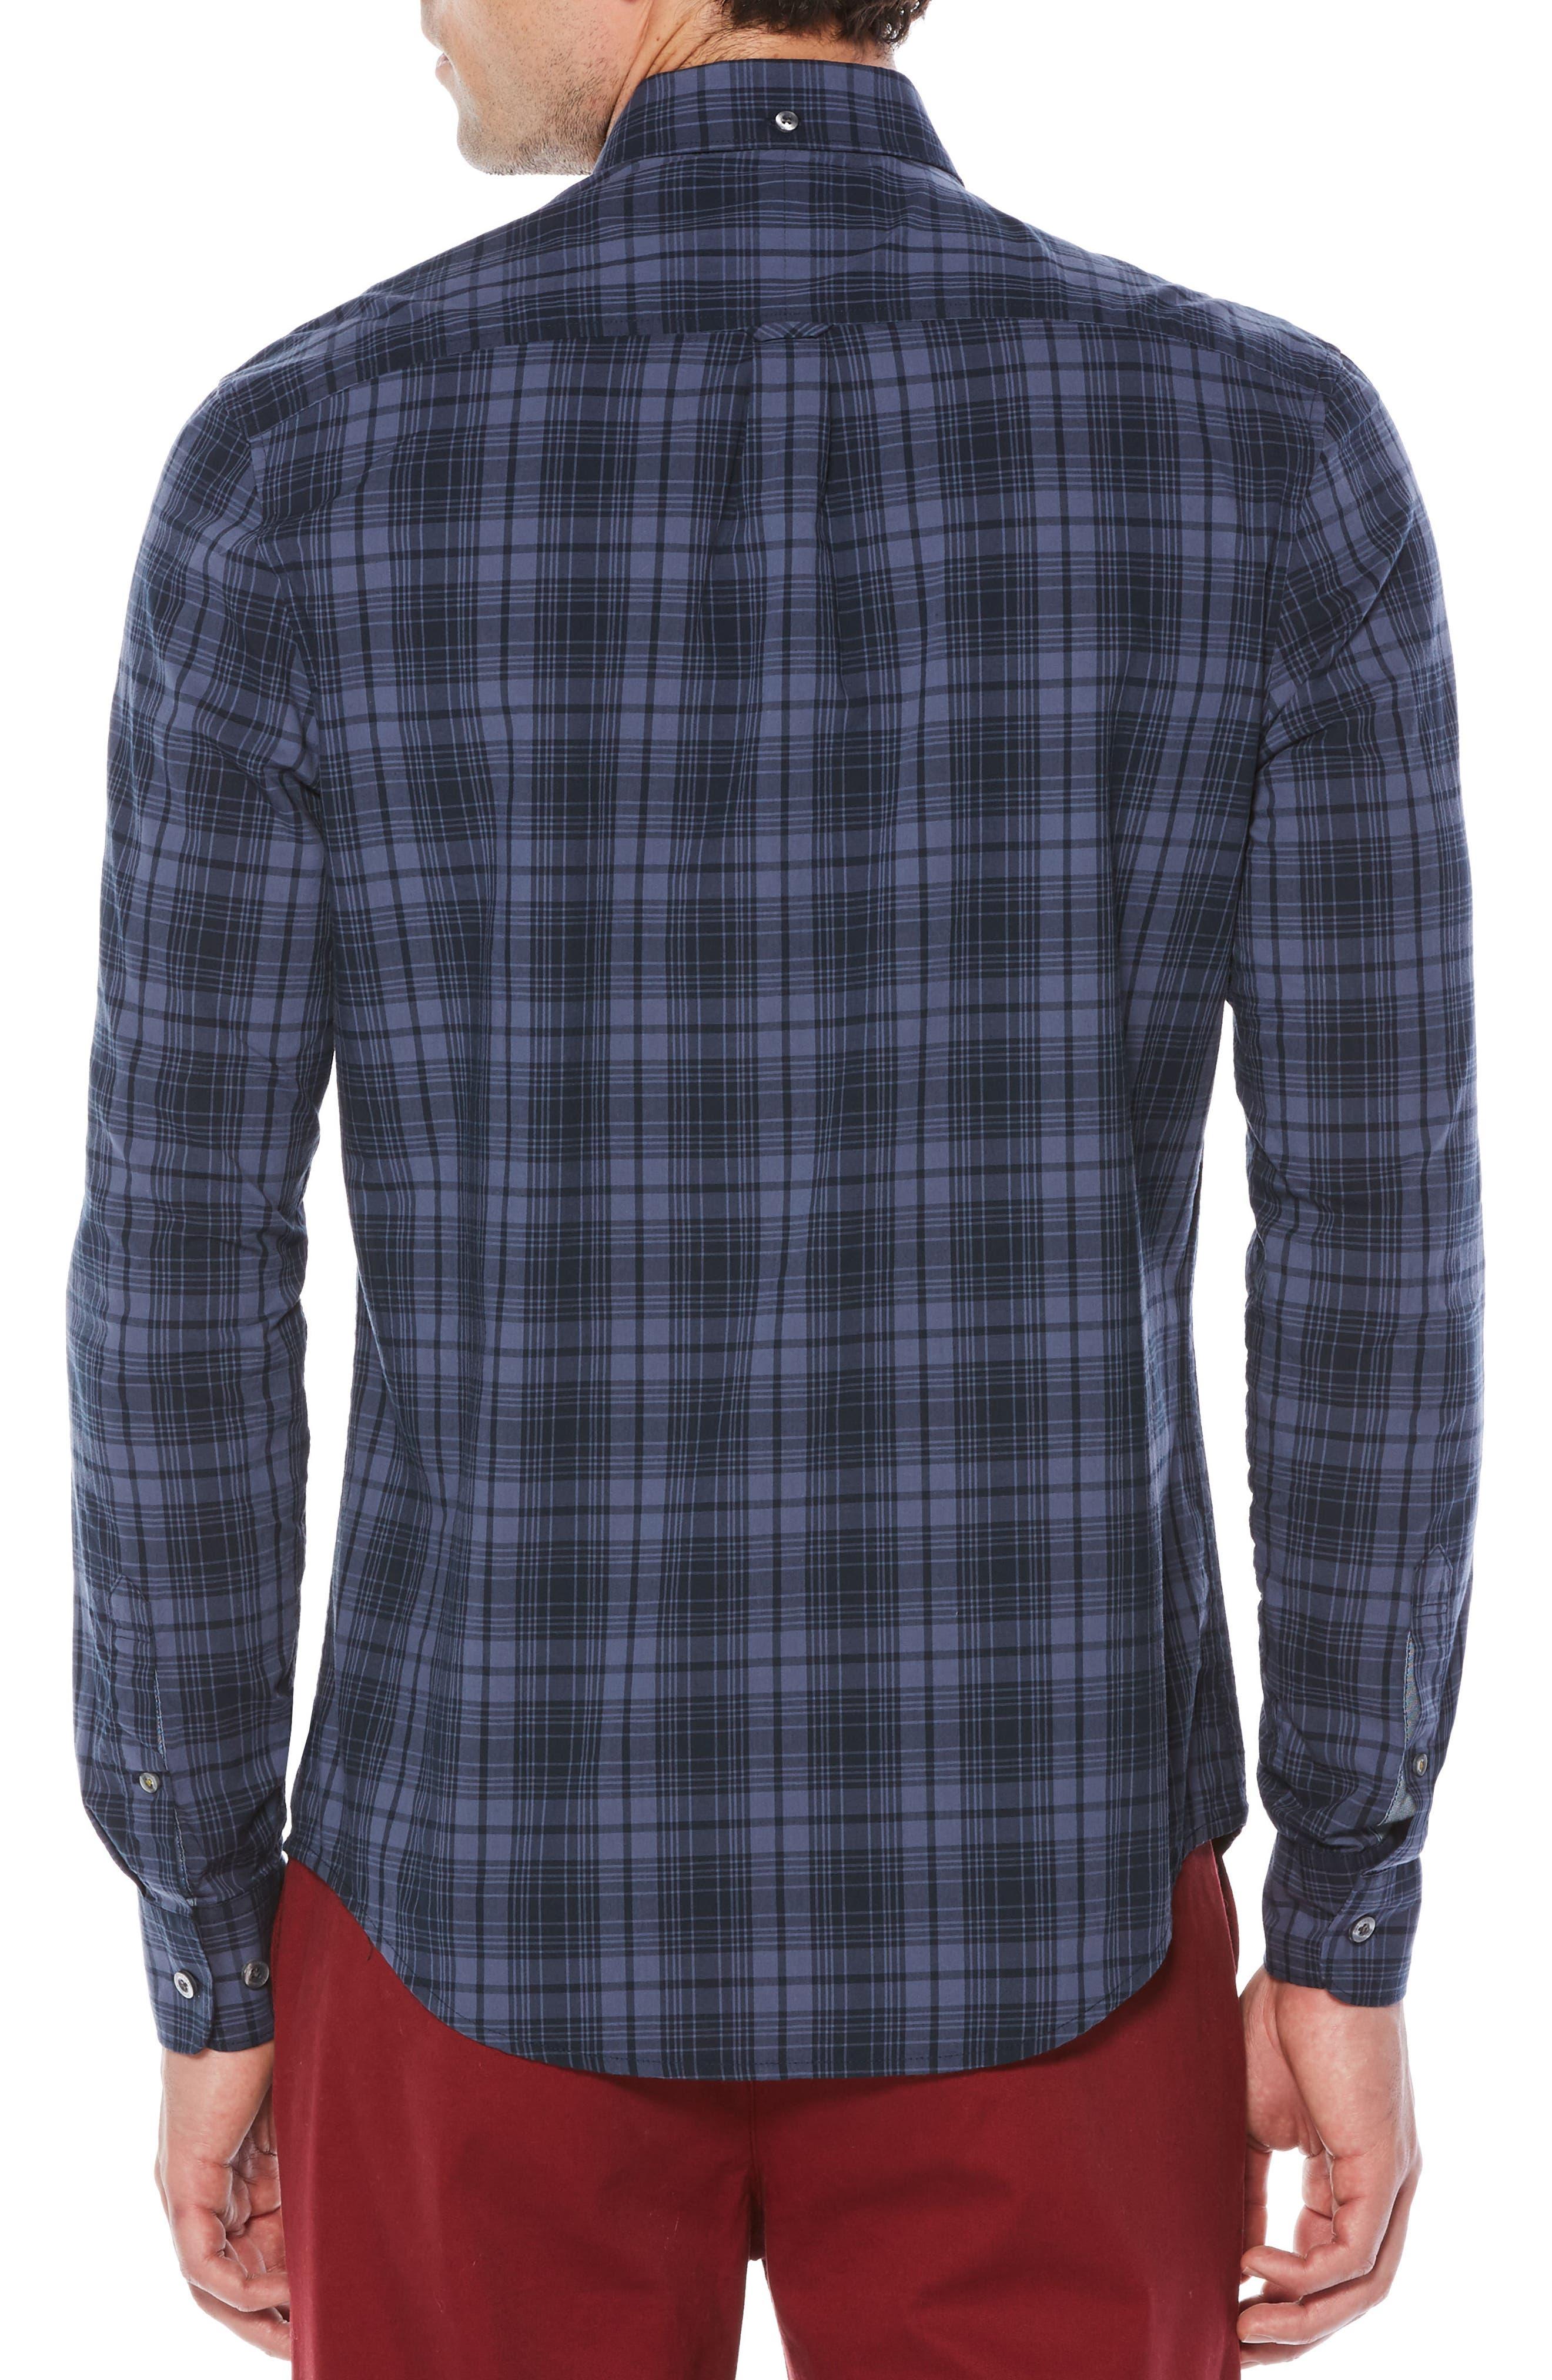 Heritage Slim Fit Plaid Shirt,                             Alternate thumbnail 2, color,                             Vintage Indigo